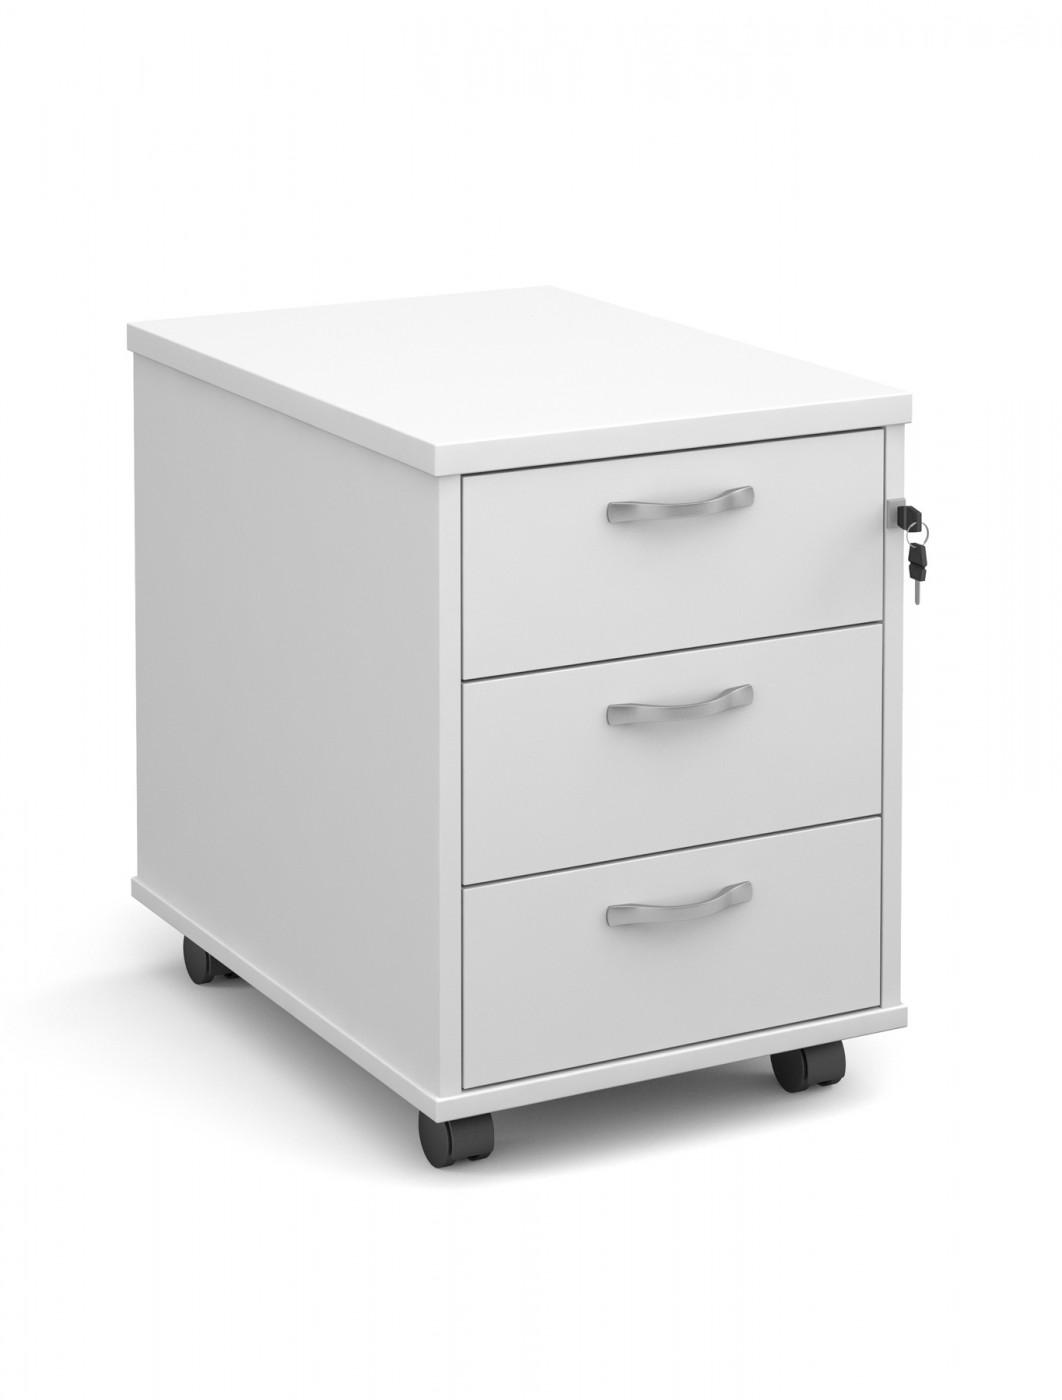 office chair pedestal dining new design storage mobile 3 drawer r3m 121